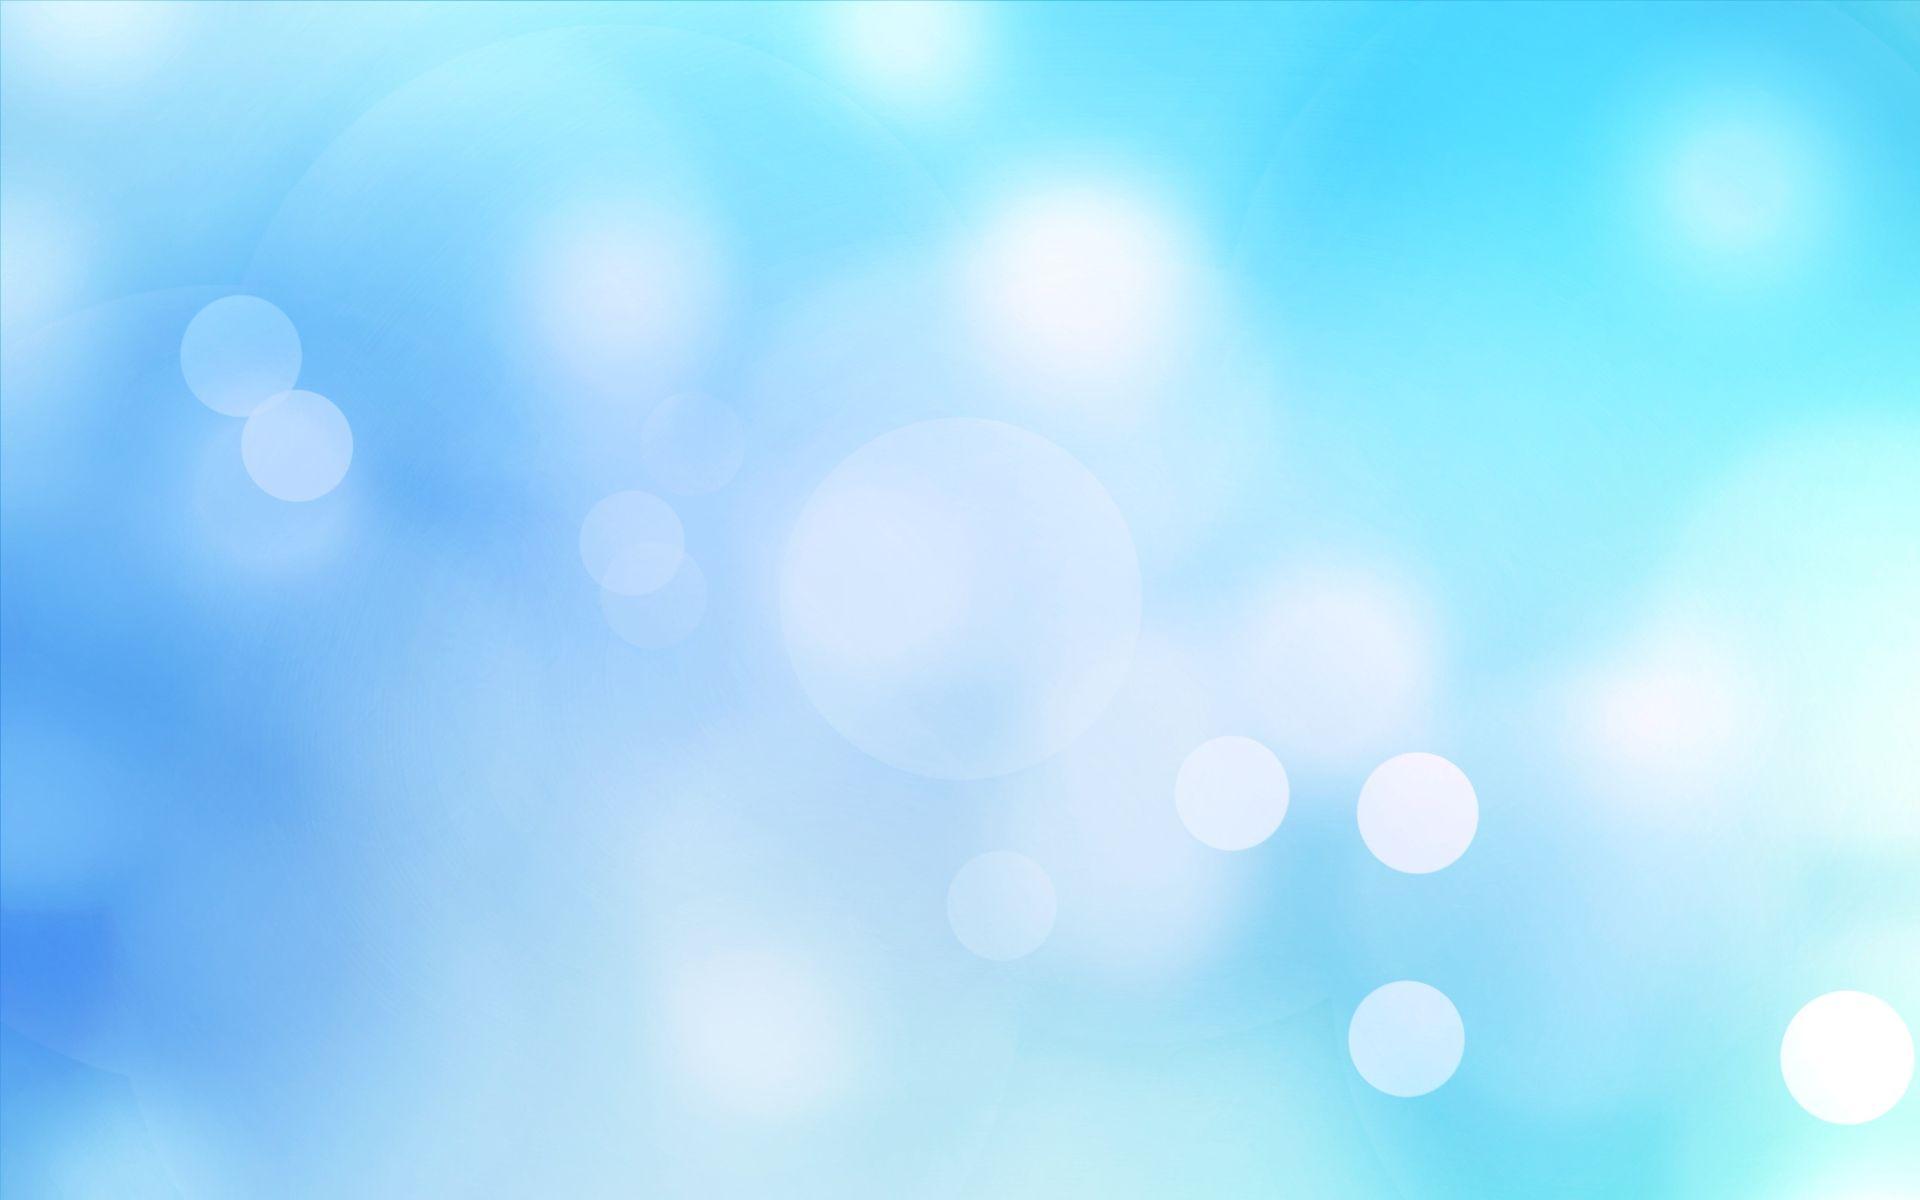 Cute Blue Clear Wallpaper Picture